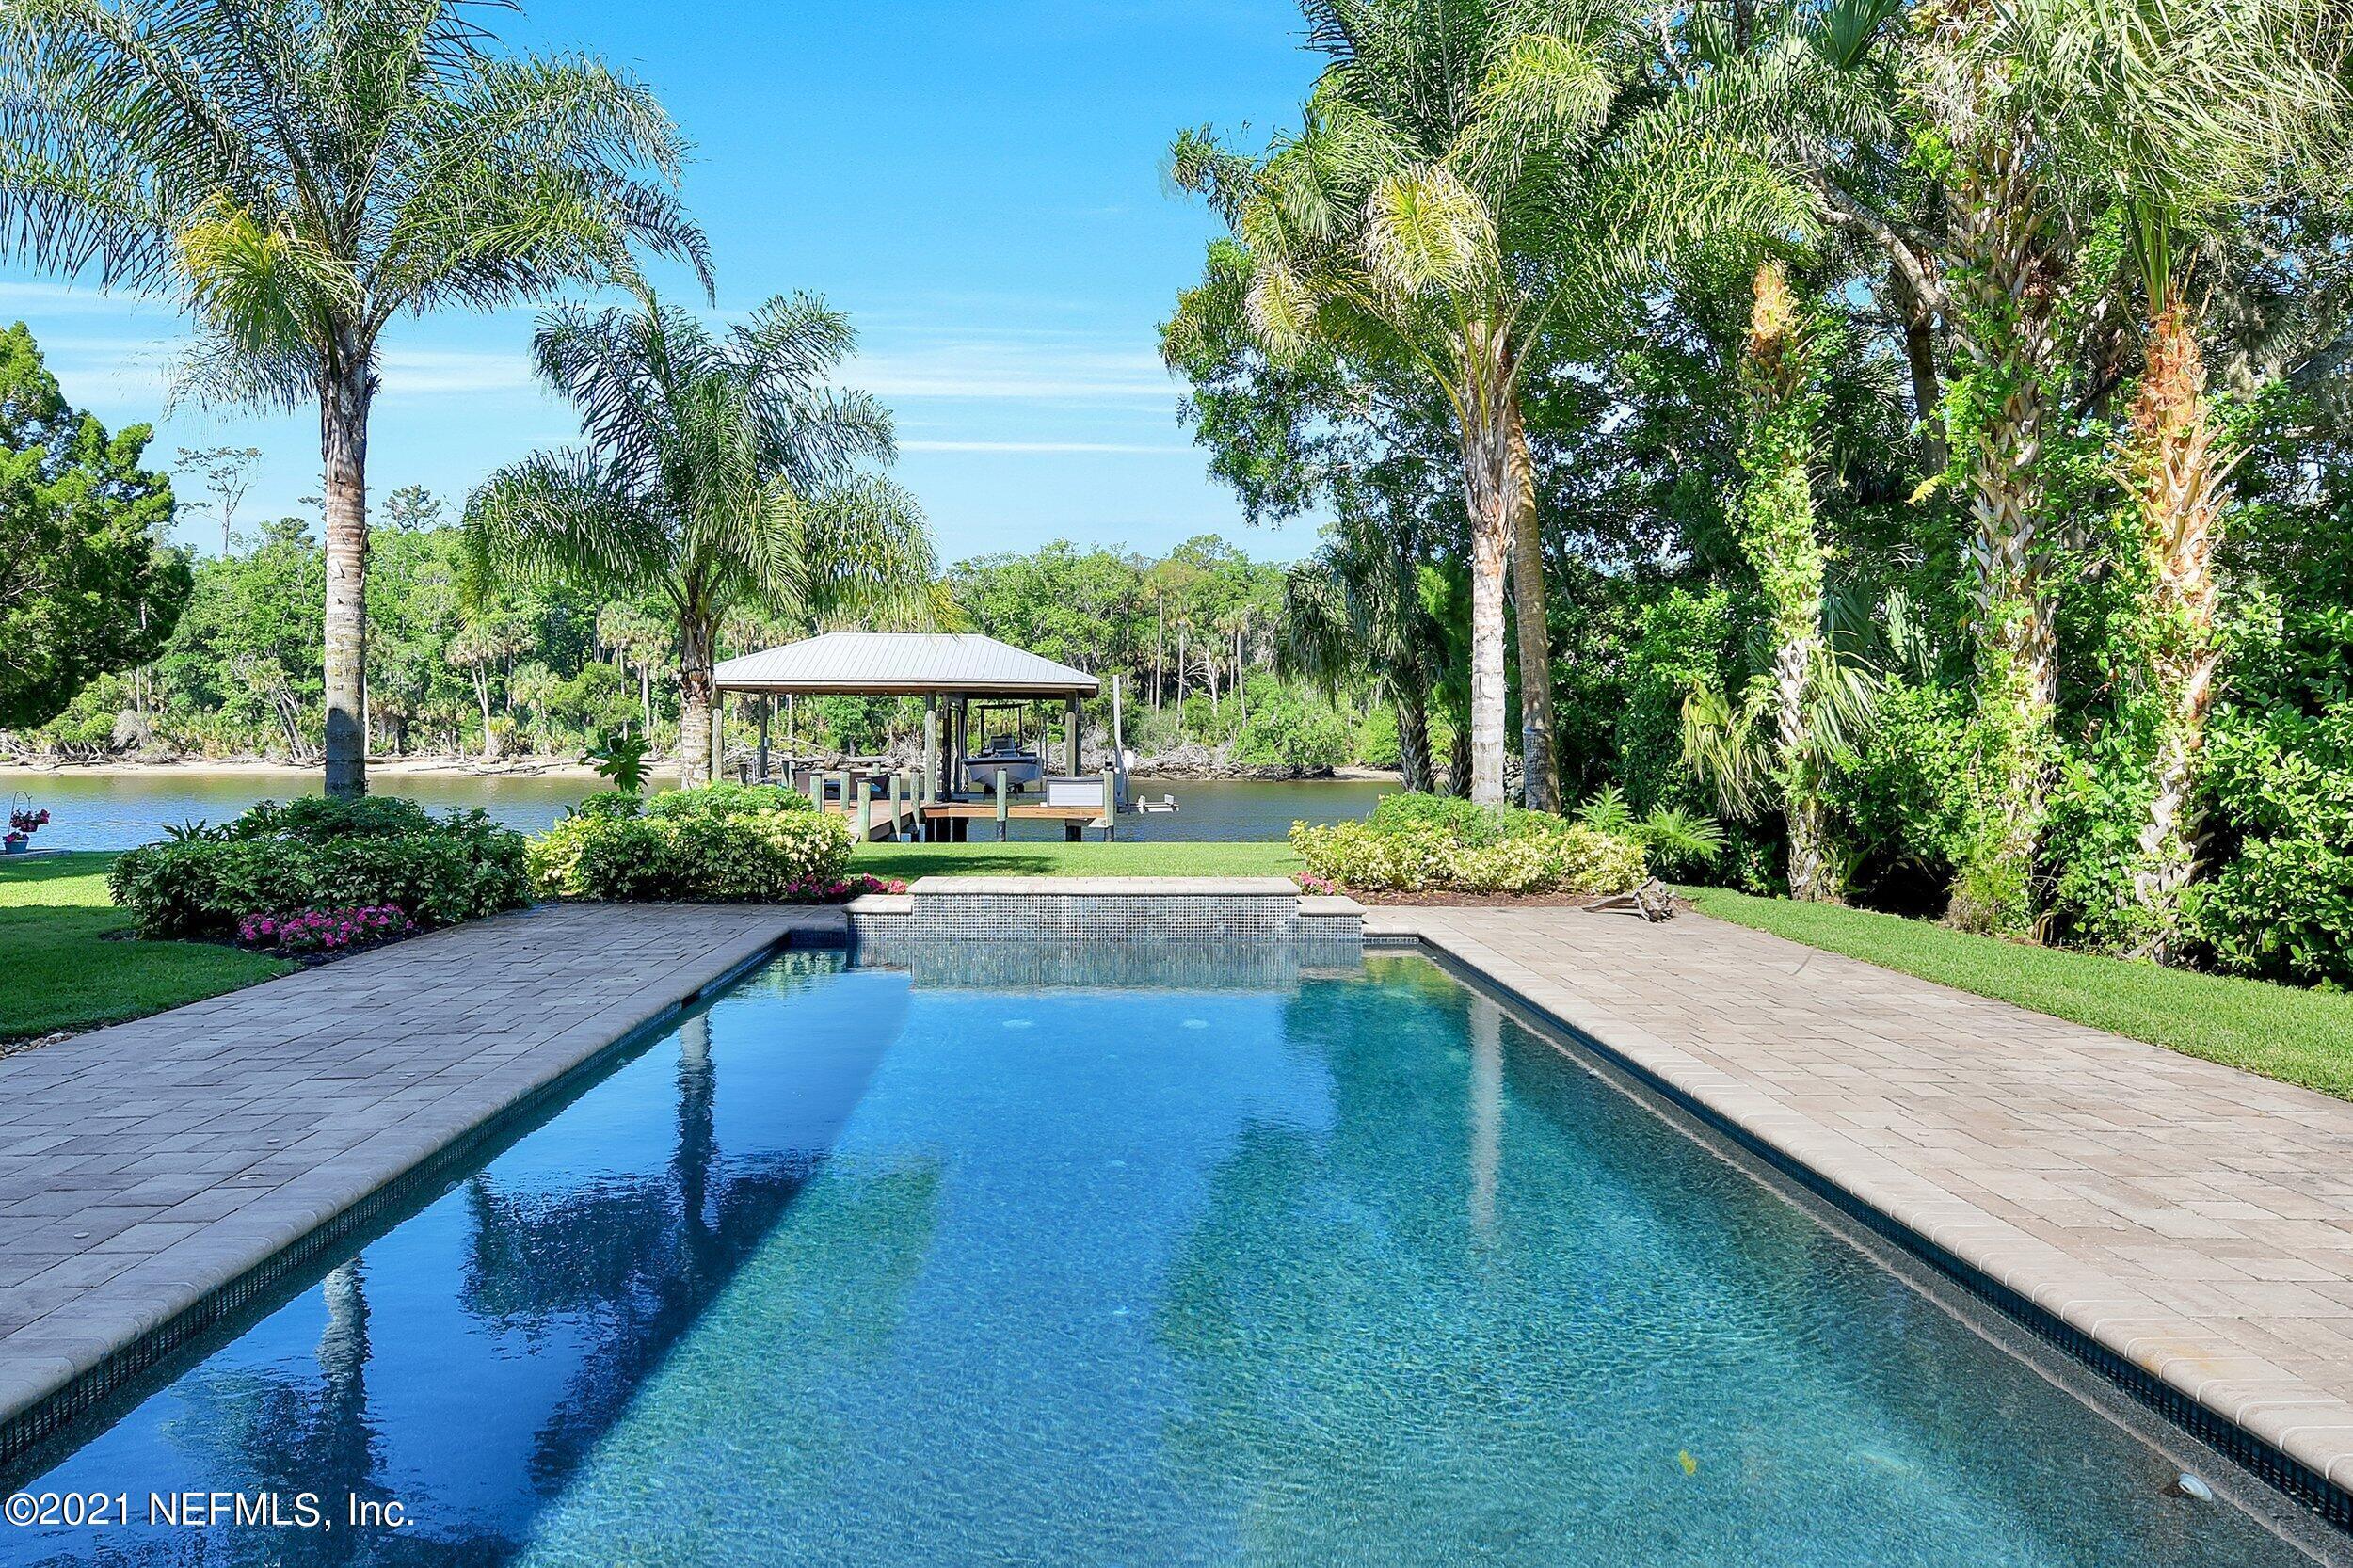 5 ROSCOE, PONTE VEDRA BEACH, FLORIDA 32082, 4 Bedrooms Bedrooms, ,4 BathroomsBathrooms,Residential,For sale,ROSCOE,1108856